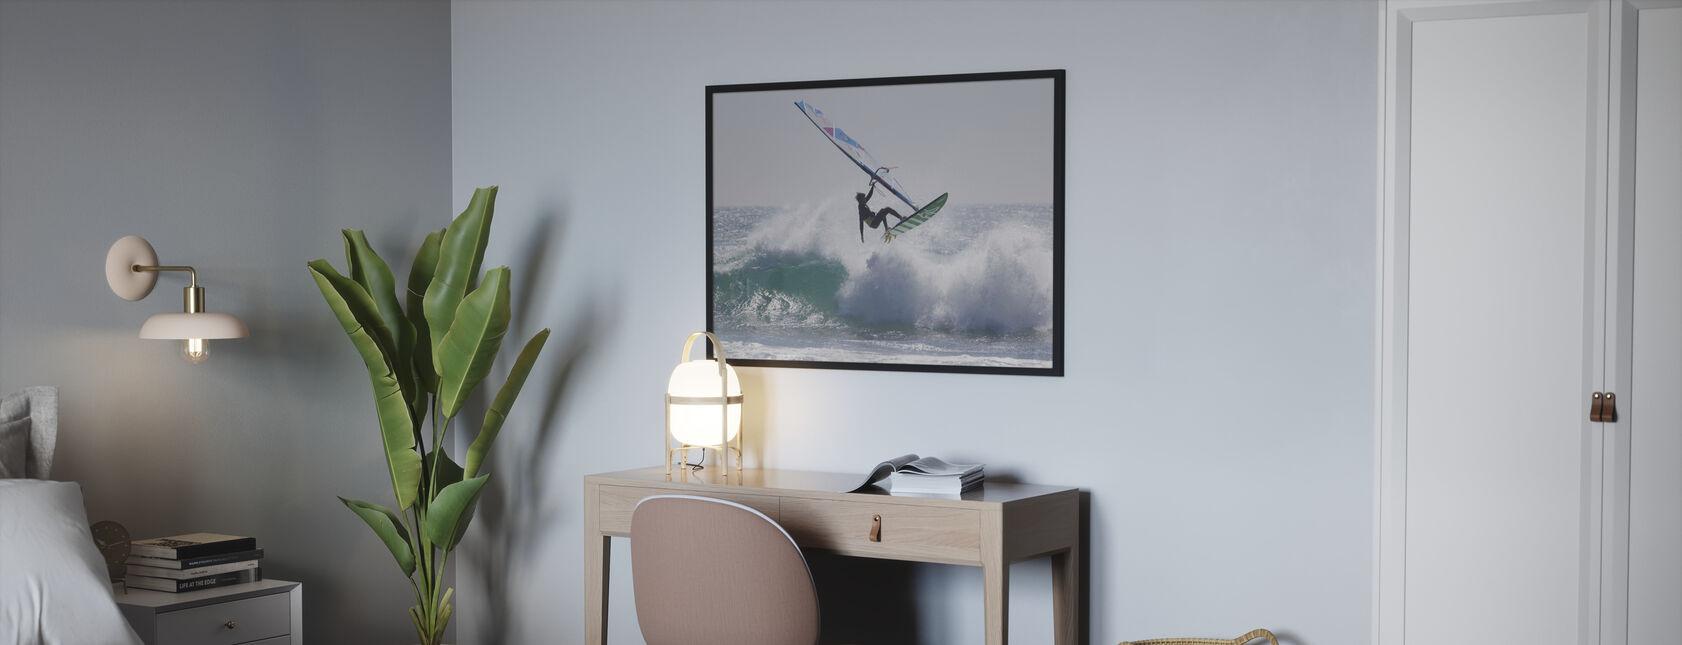 Windsurfing Jump - Poster - Bedroom